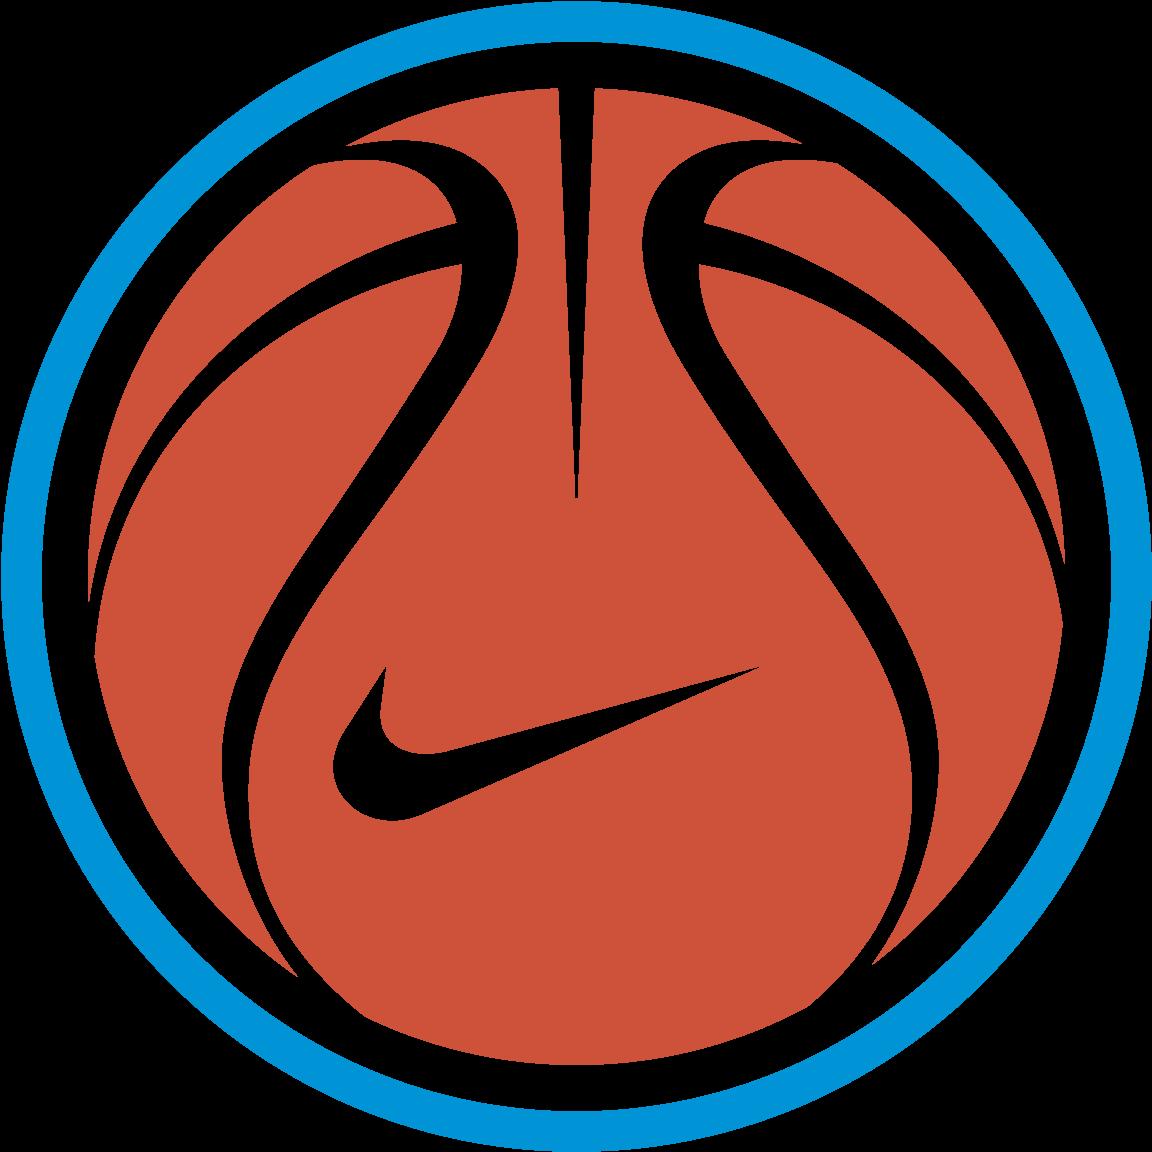 Nike Basketball Logo Vector Free Vector Silhouette - Nike ... - Nike Shoes Logo